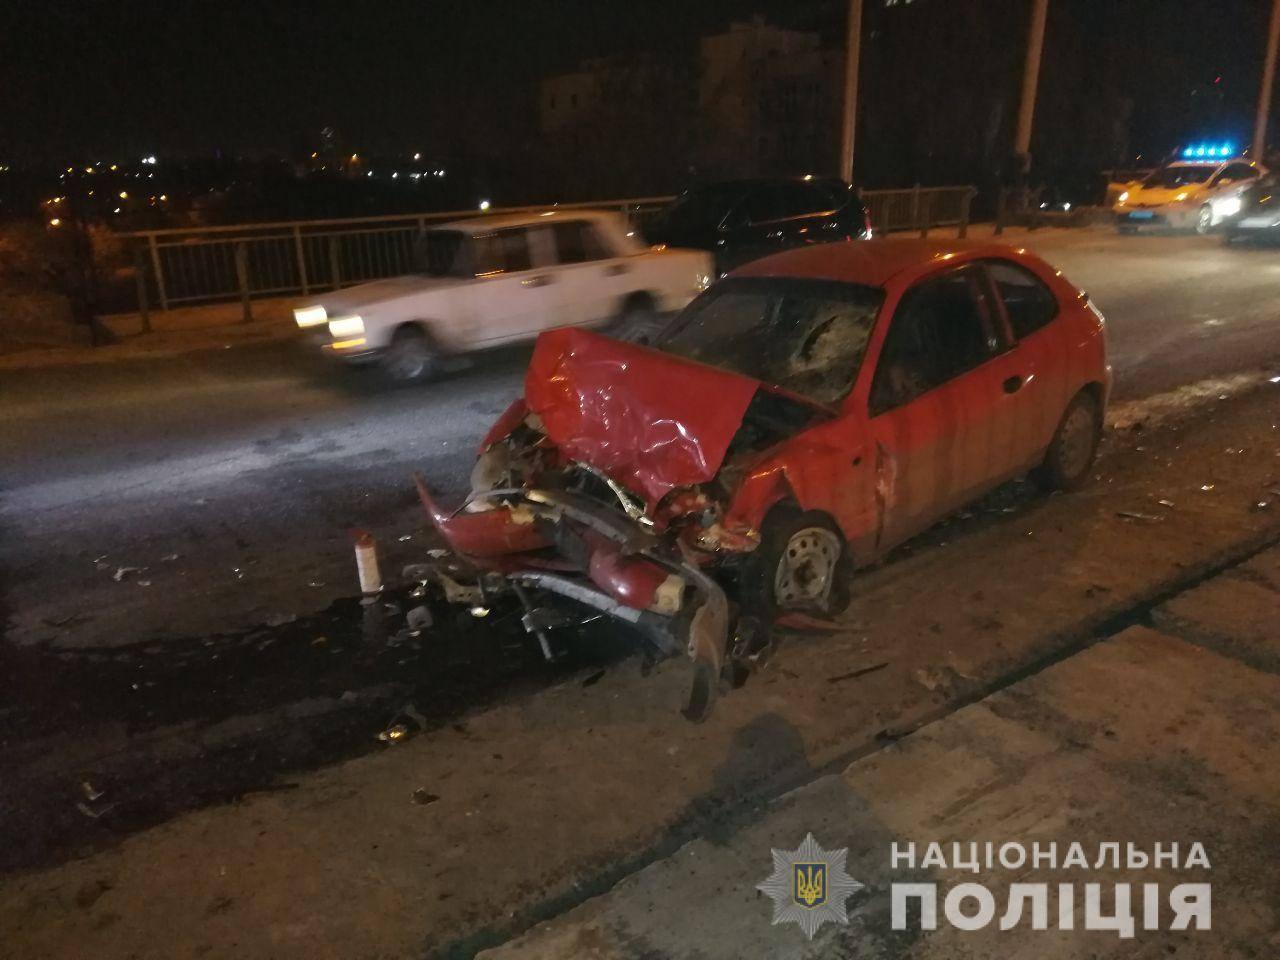 ДТП в Харькове: водитель погиб на месте (фото)